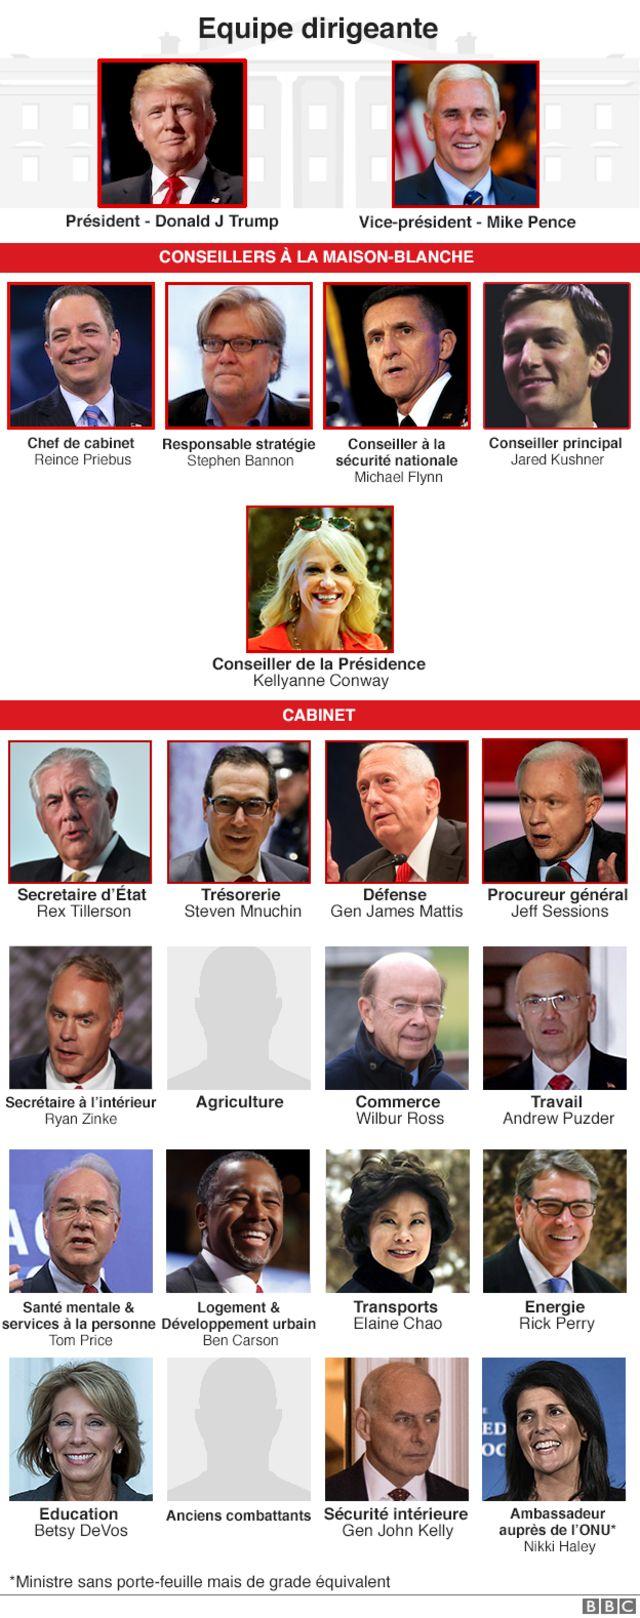 Equipe dirigeante de Trump